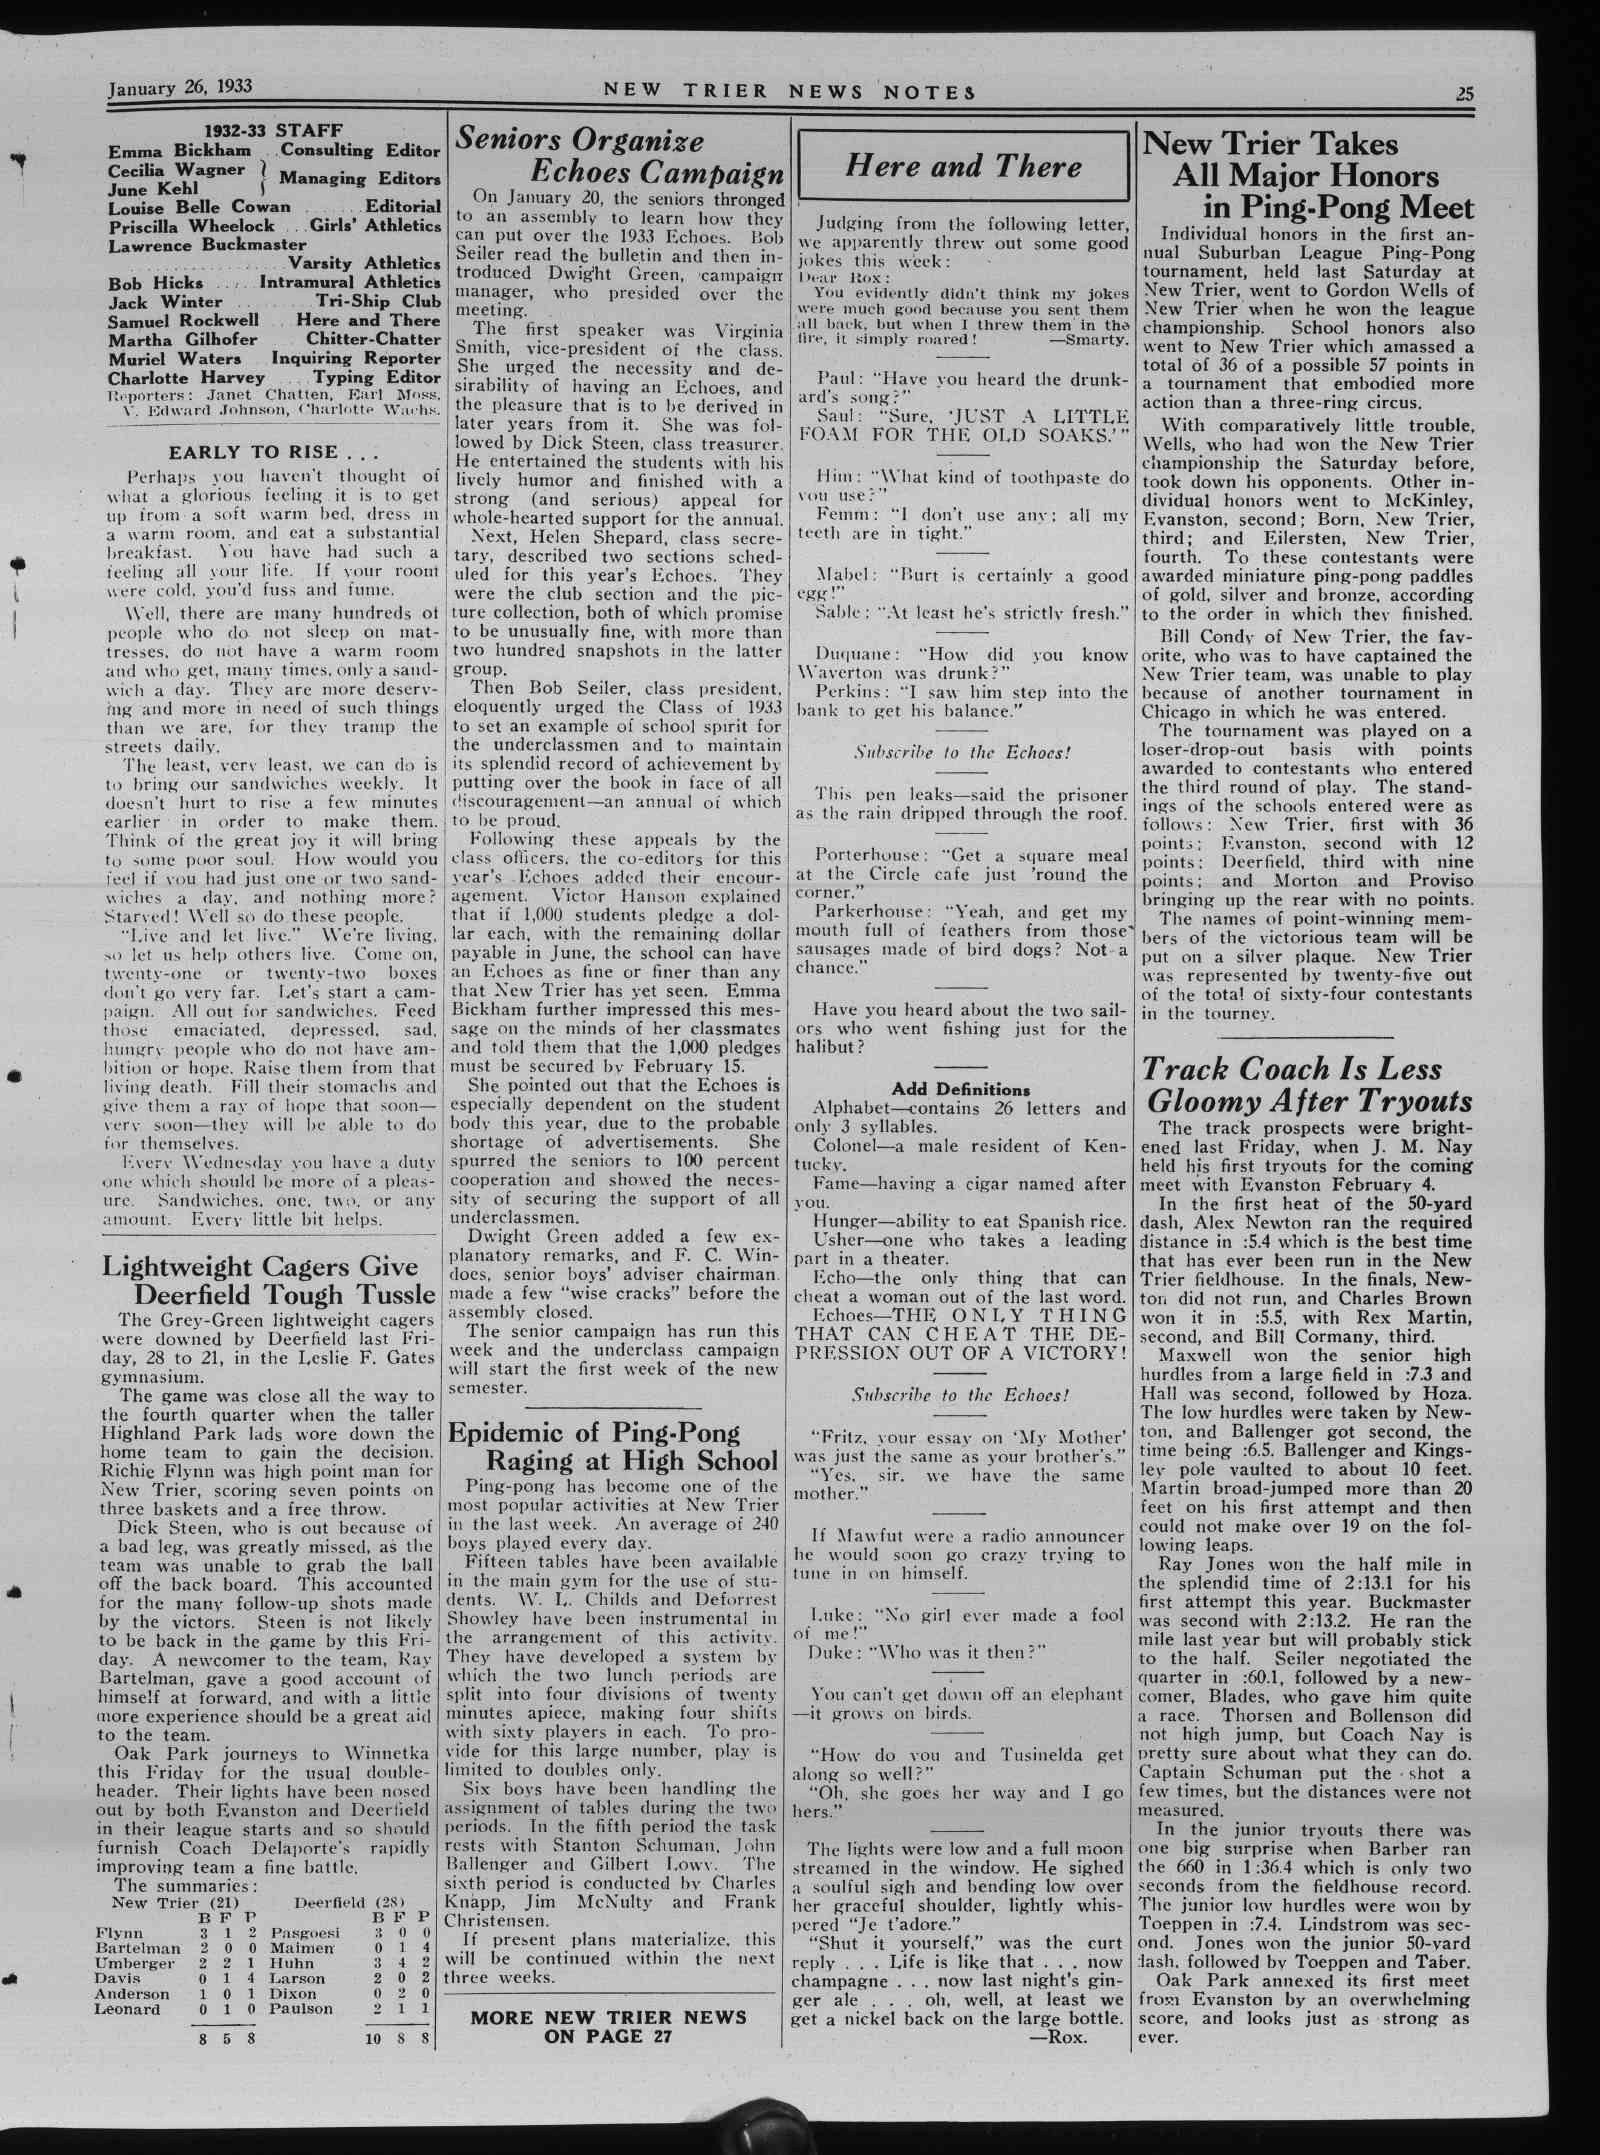 Wilmette Life (Wilmette, Illinois), 26 Jan 1933